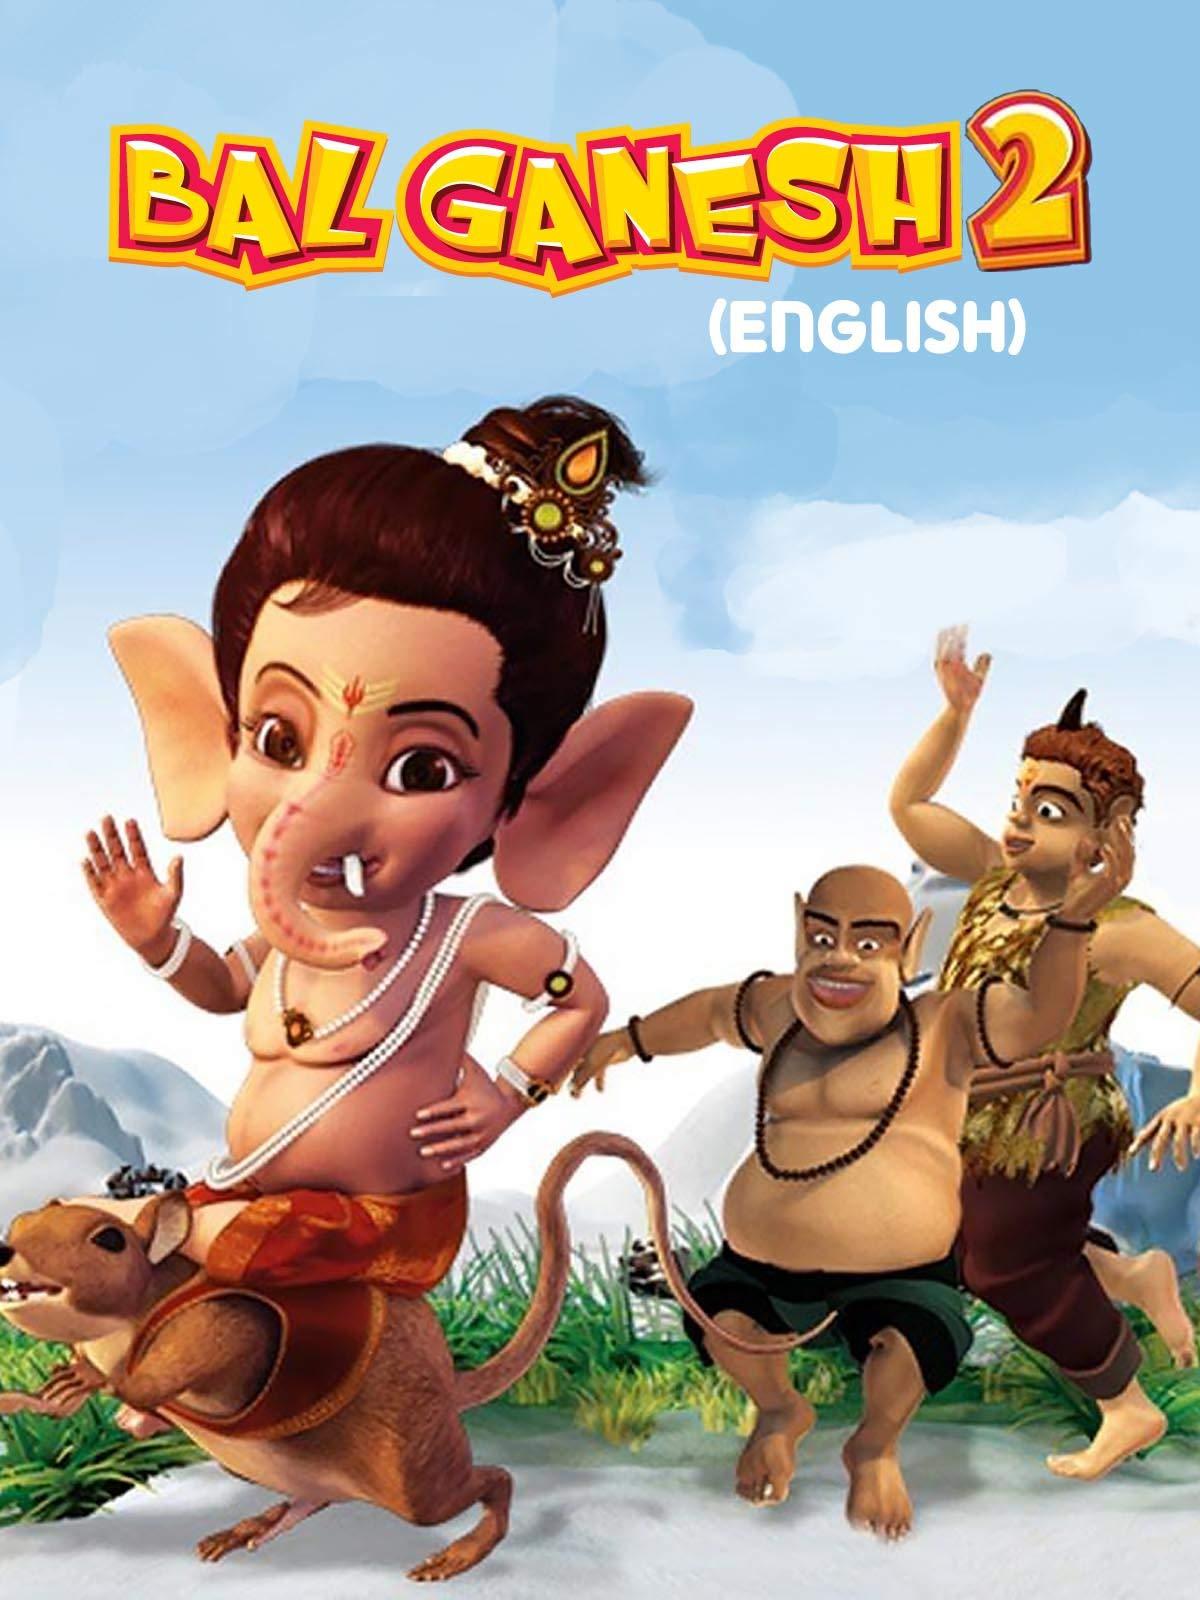 Bal Ganesh 2 (English)